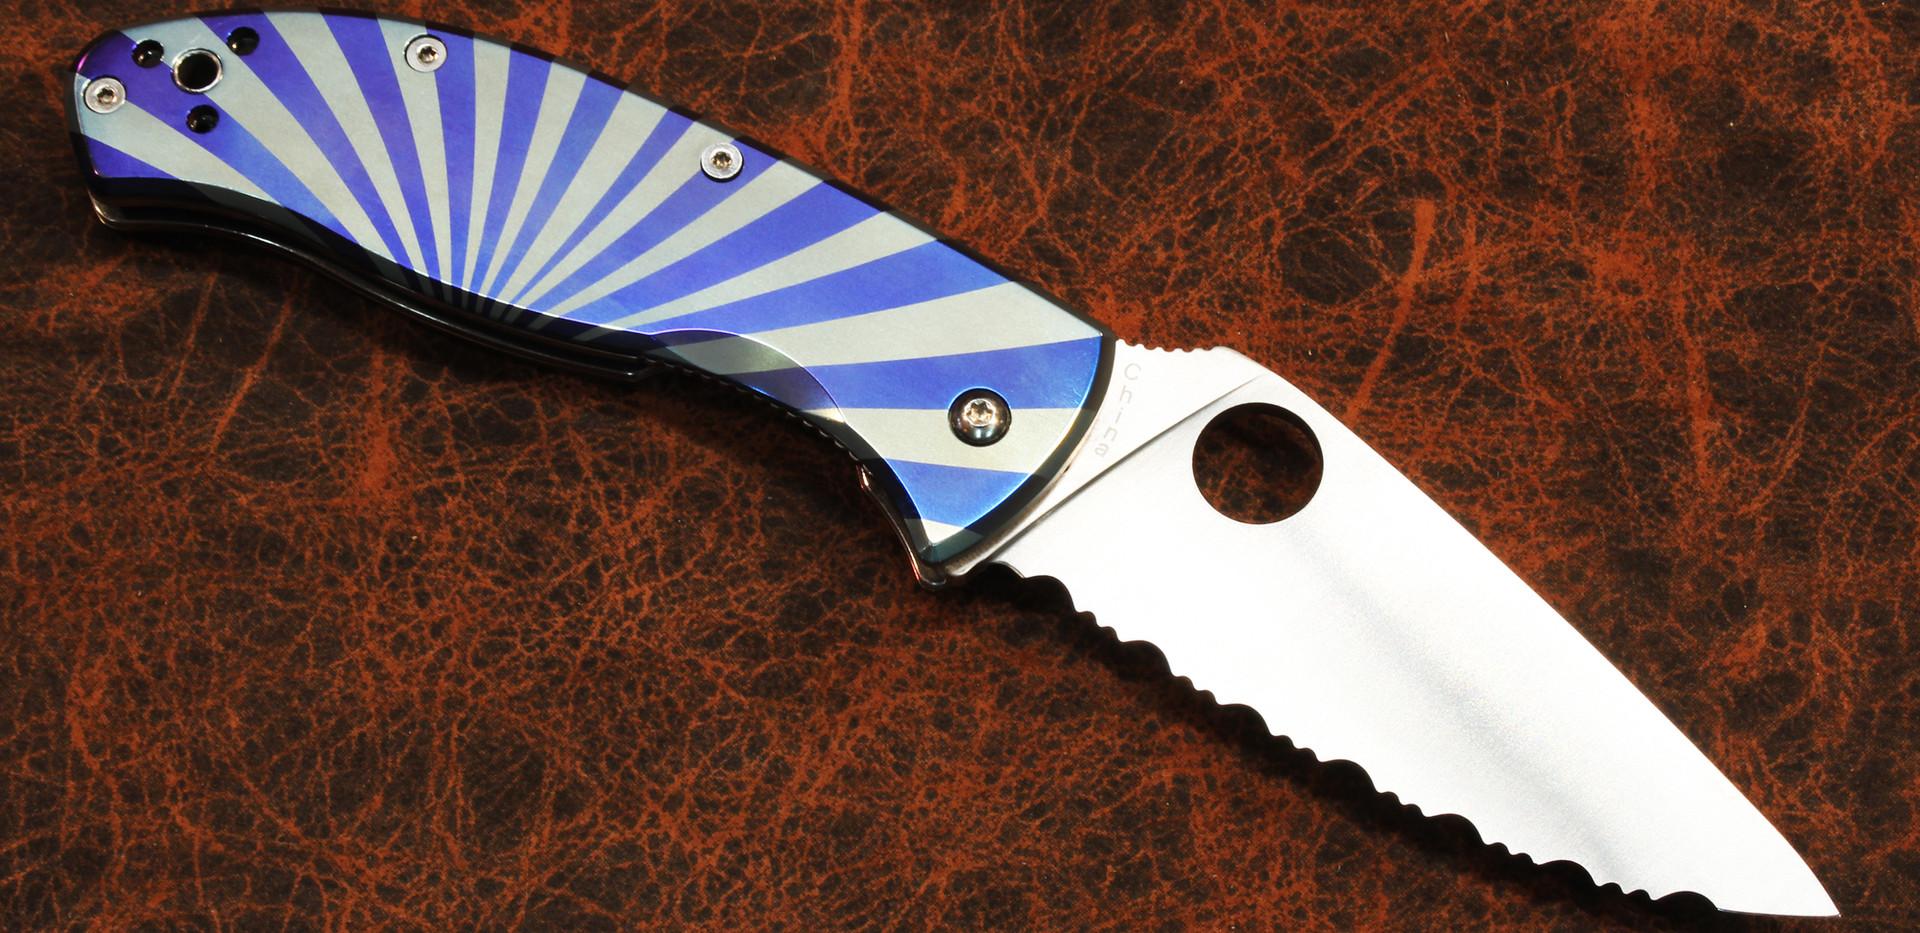 Spyderco Tenacious with Starburst 2 Pattern